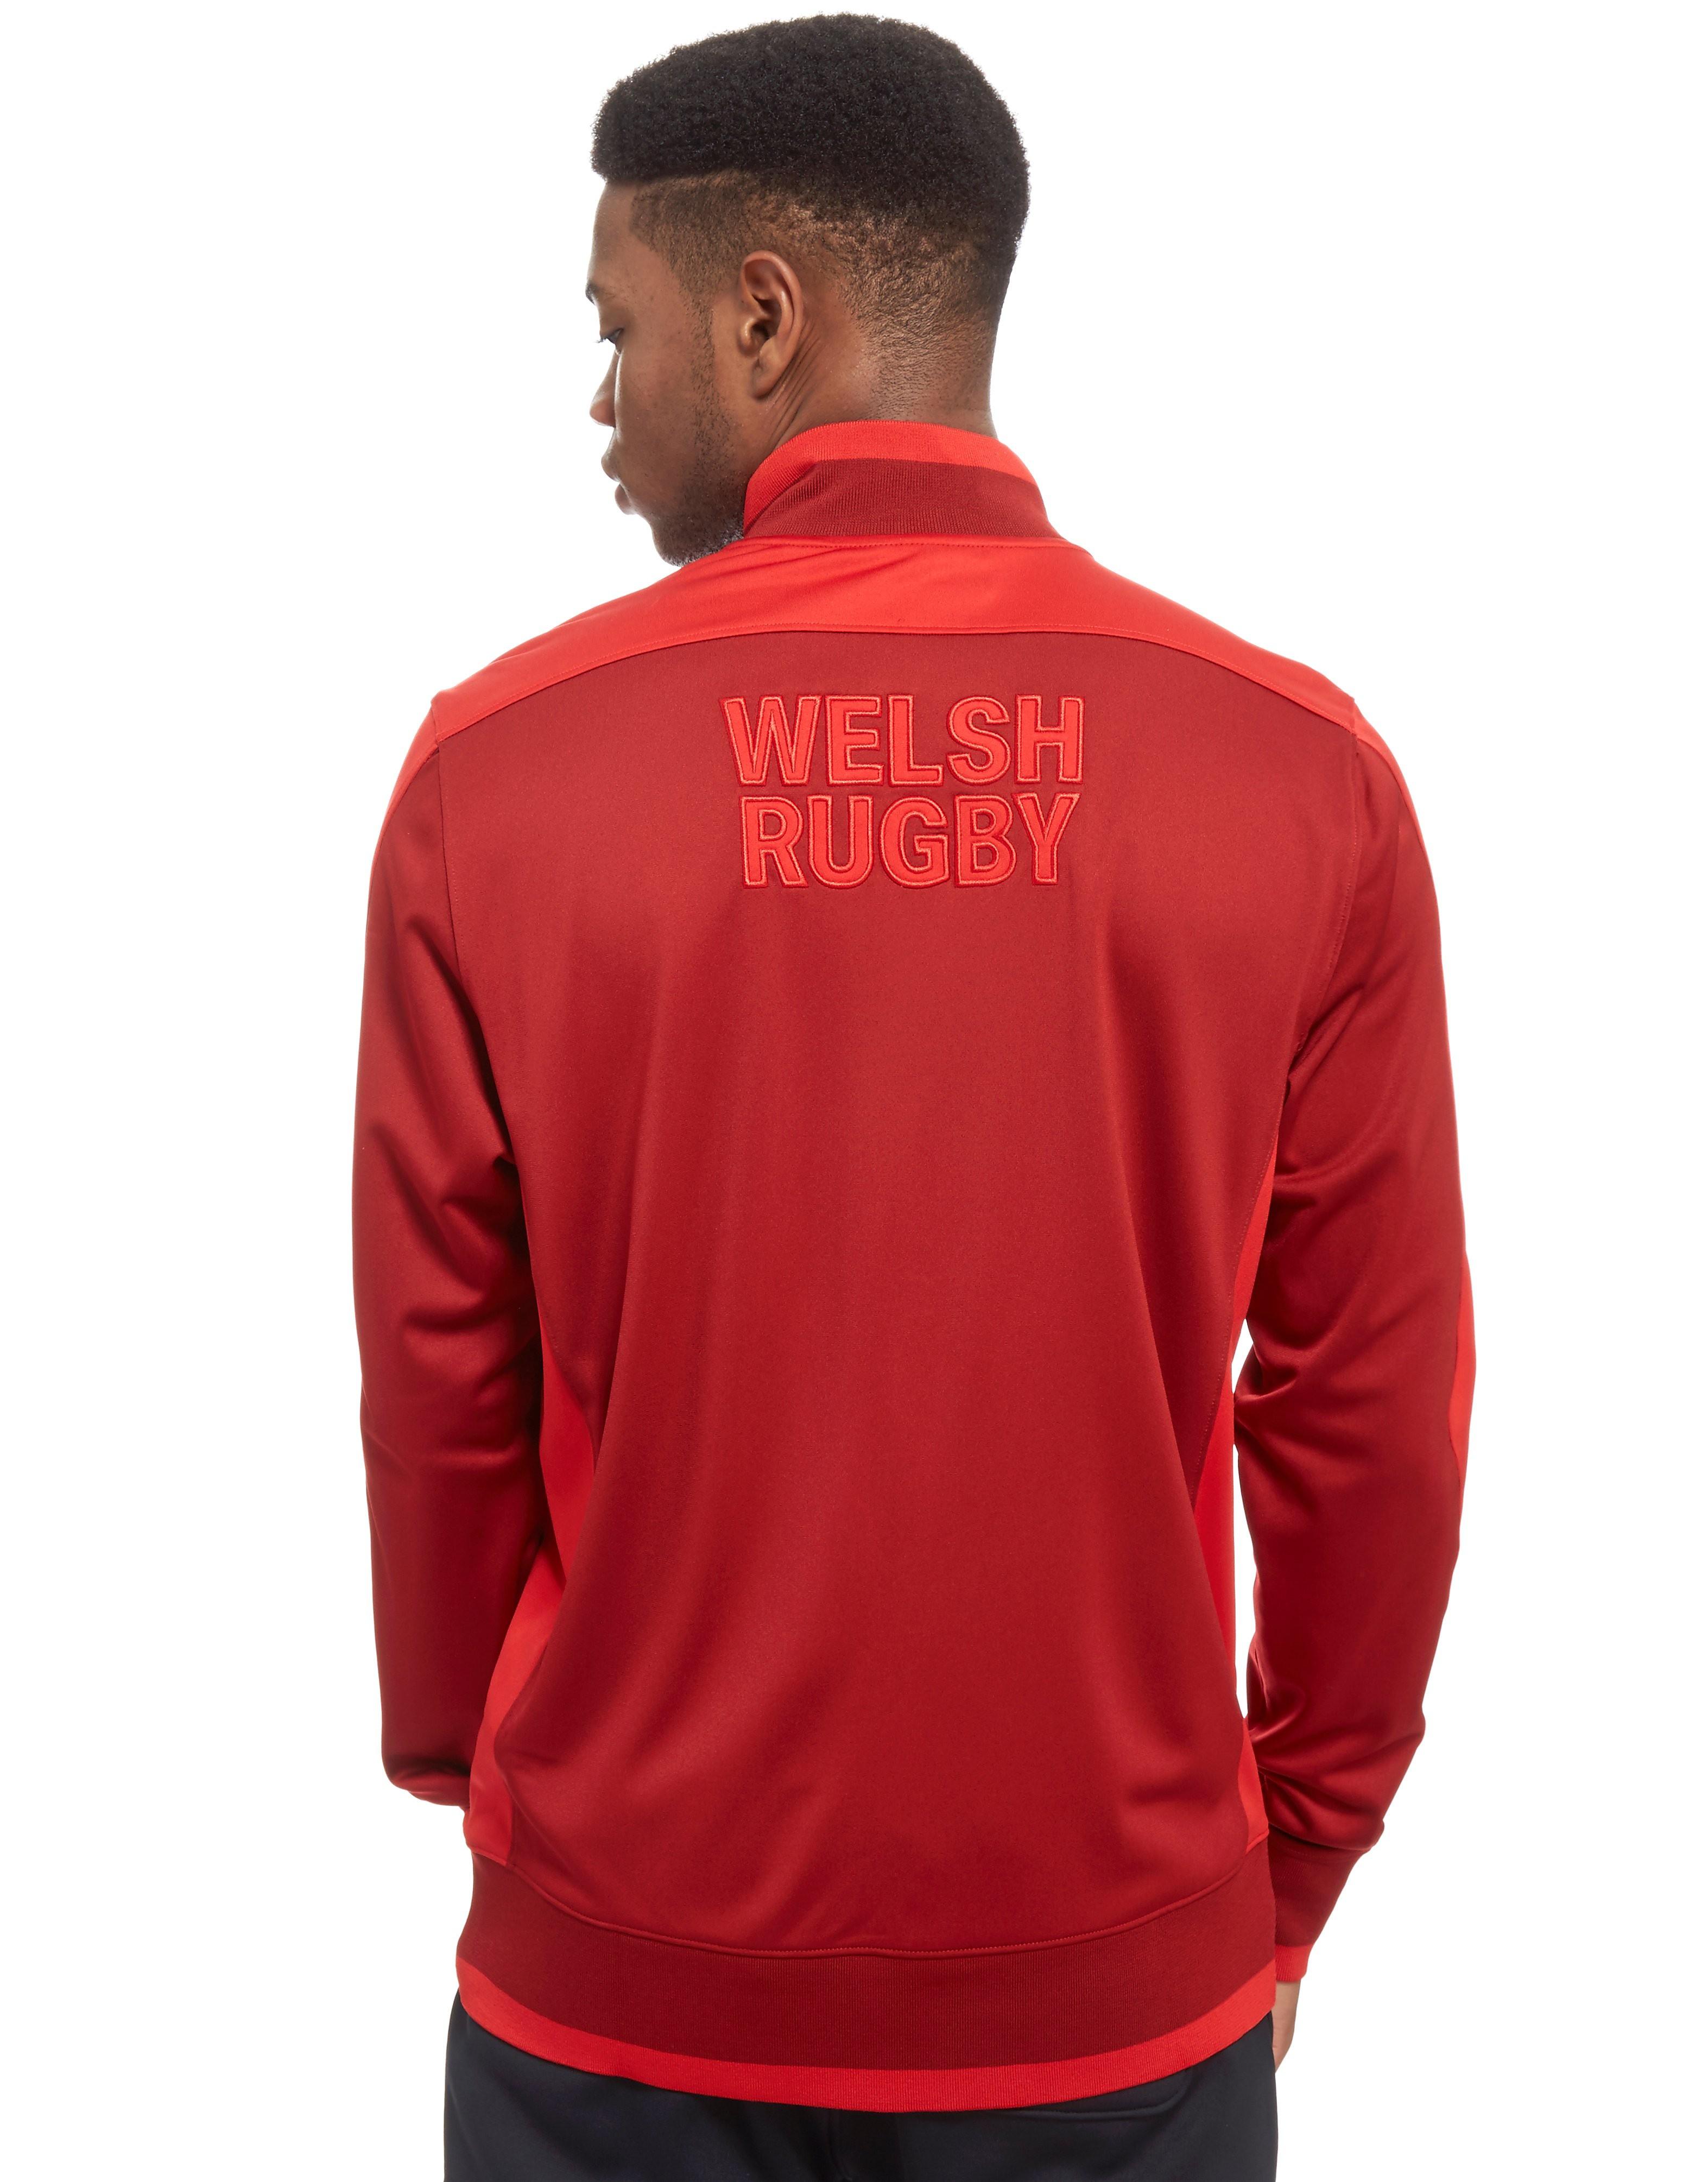 Under Armour Wales RU Track Jacket